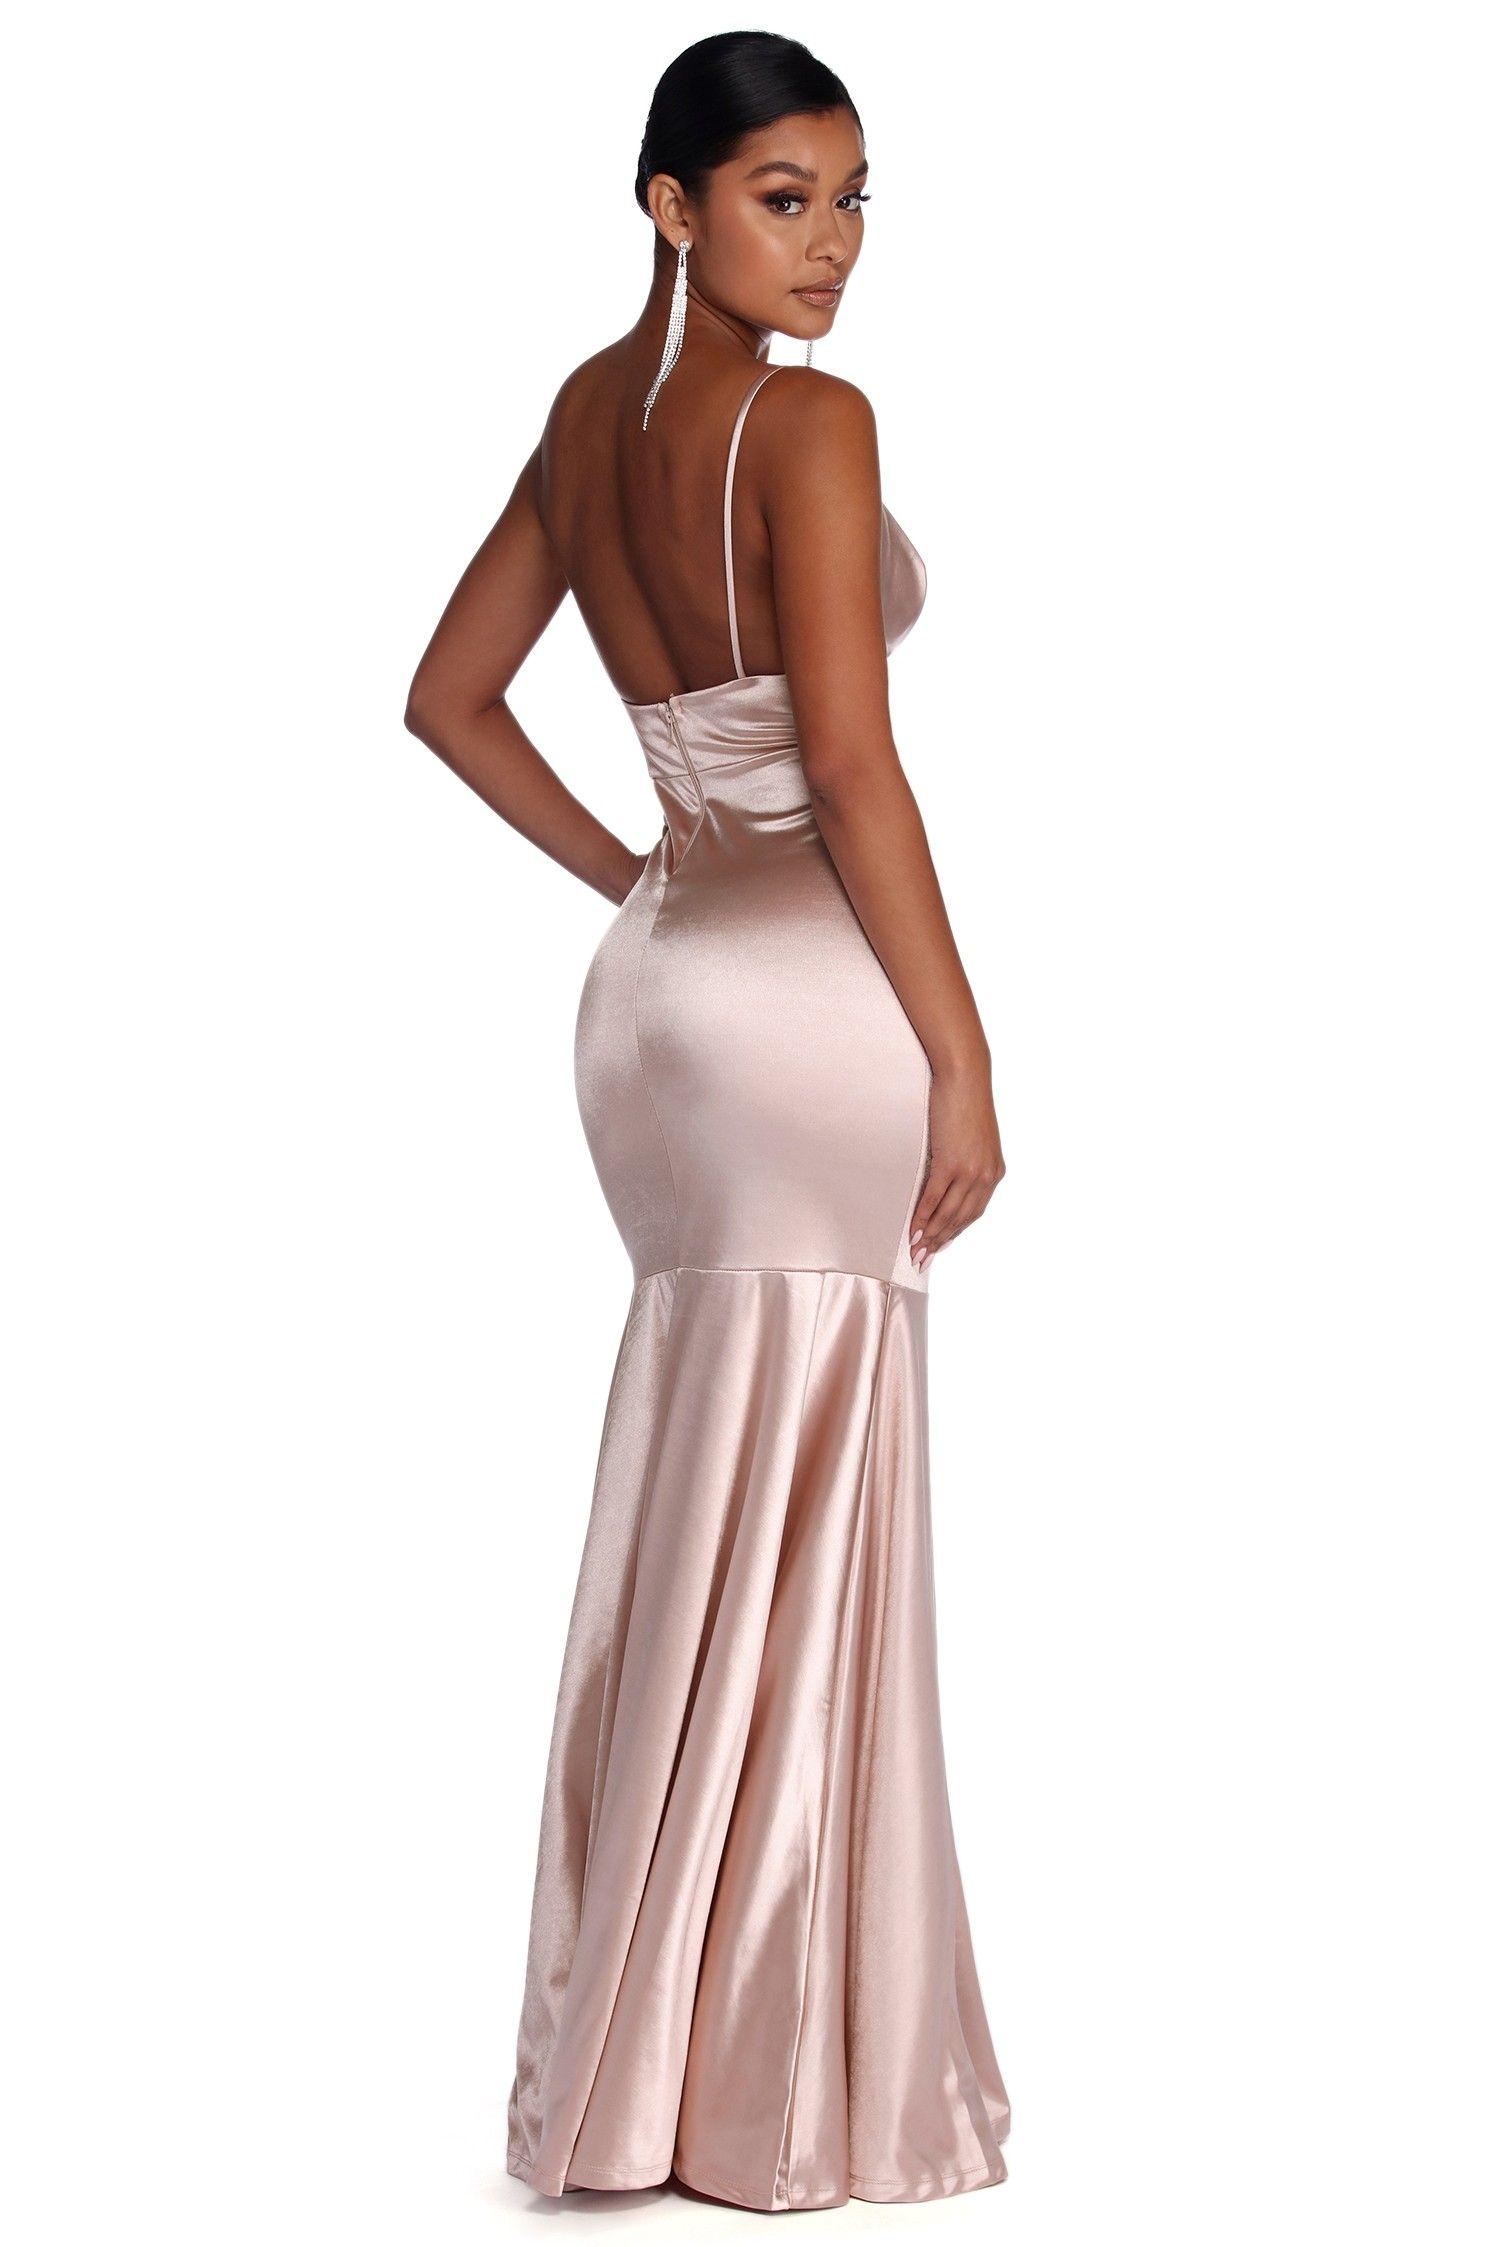 Isabel Pink Formal Satin Mermaid Dress Dresses Mermaid Dresses Ball Gowns [ 2247 x 1500 Pixel ]